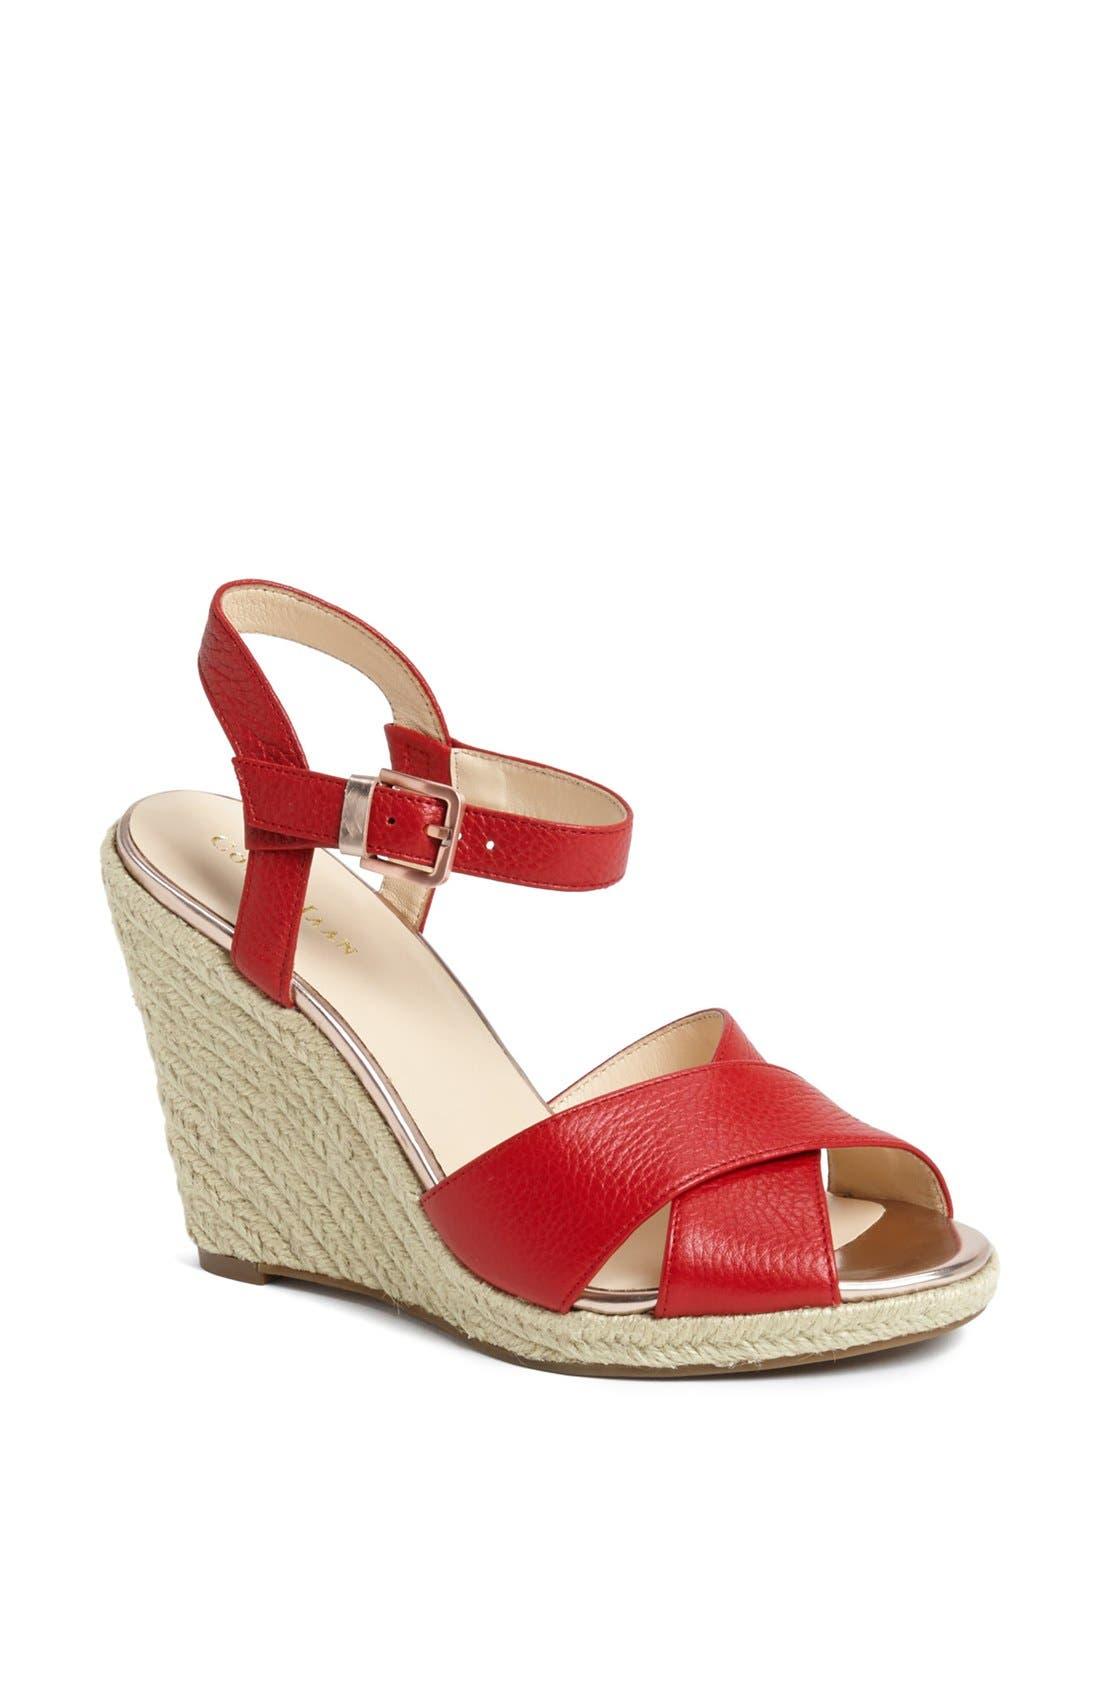 Main Image - Cole Haan 'Hart' Wedge Platform Sandal